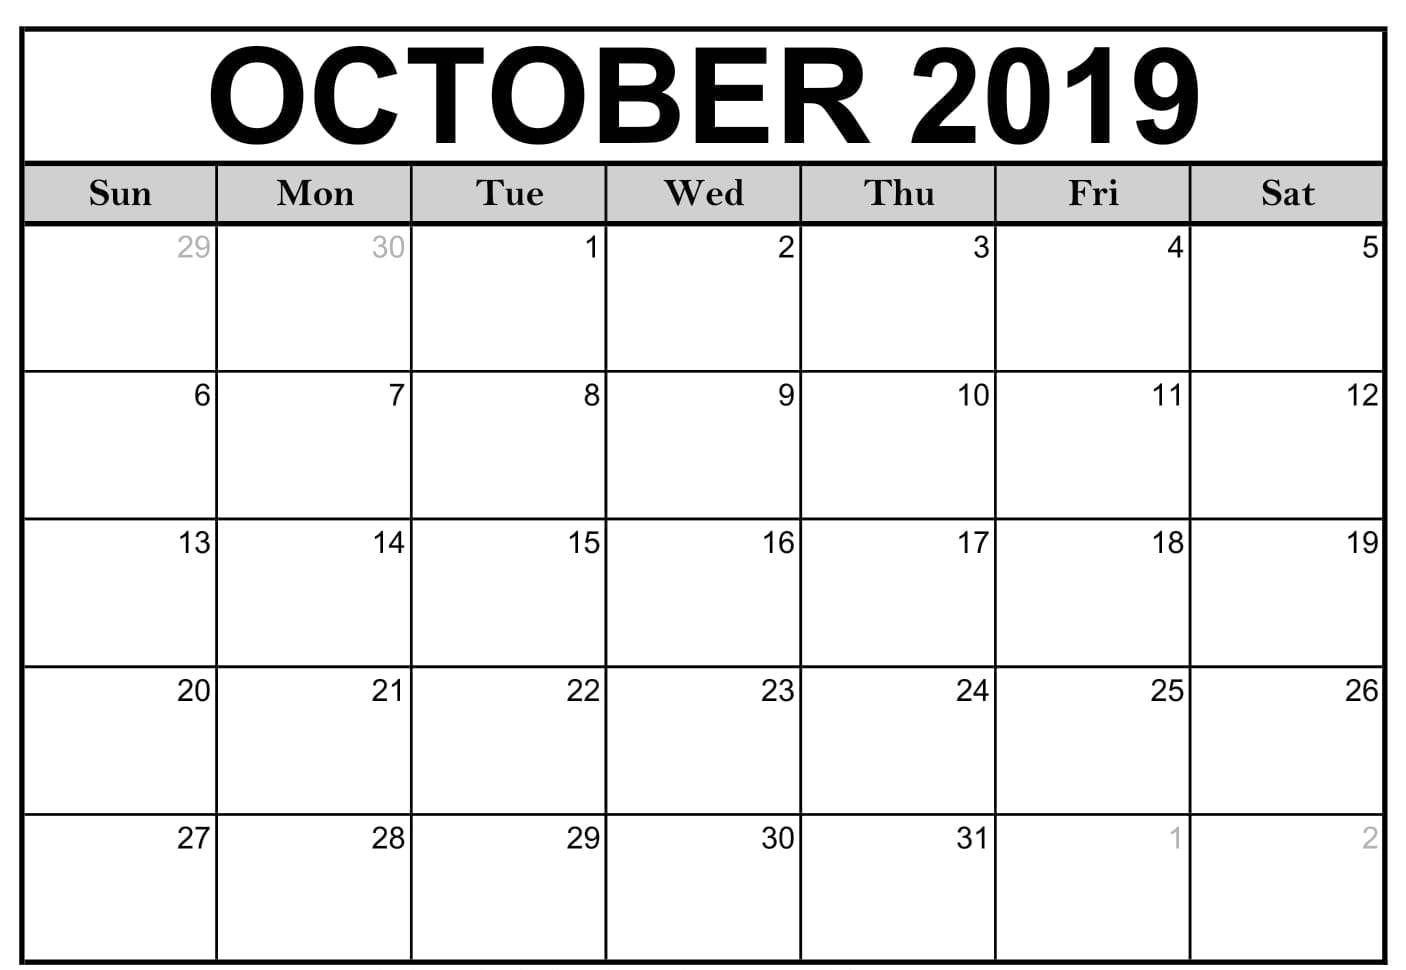 Calendar For October 2019 Pdf In 2020 | Calendar Printables within Fill In Calendar 2019 Pdf